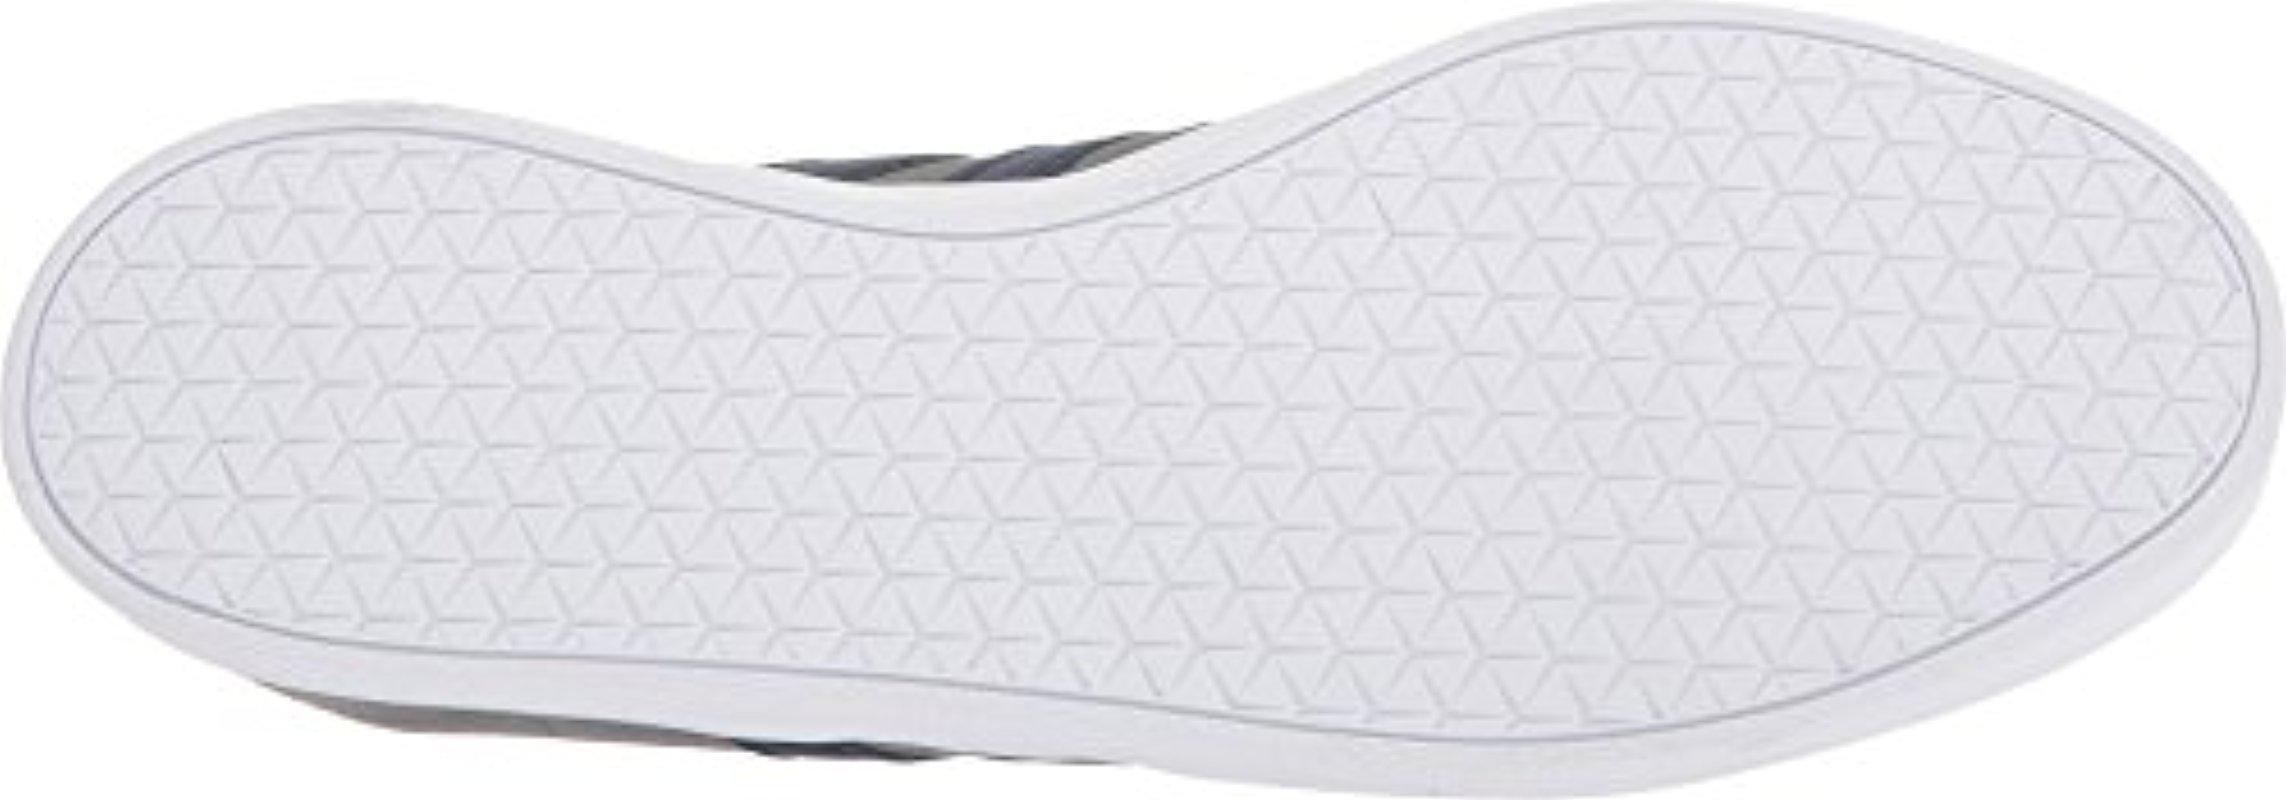 size 40 a9d37 9fb7e Lyst - adidas Originals Adidas Vl Court 2.0, Grey Threegrey